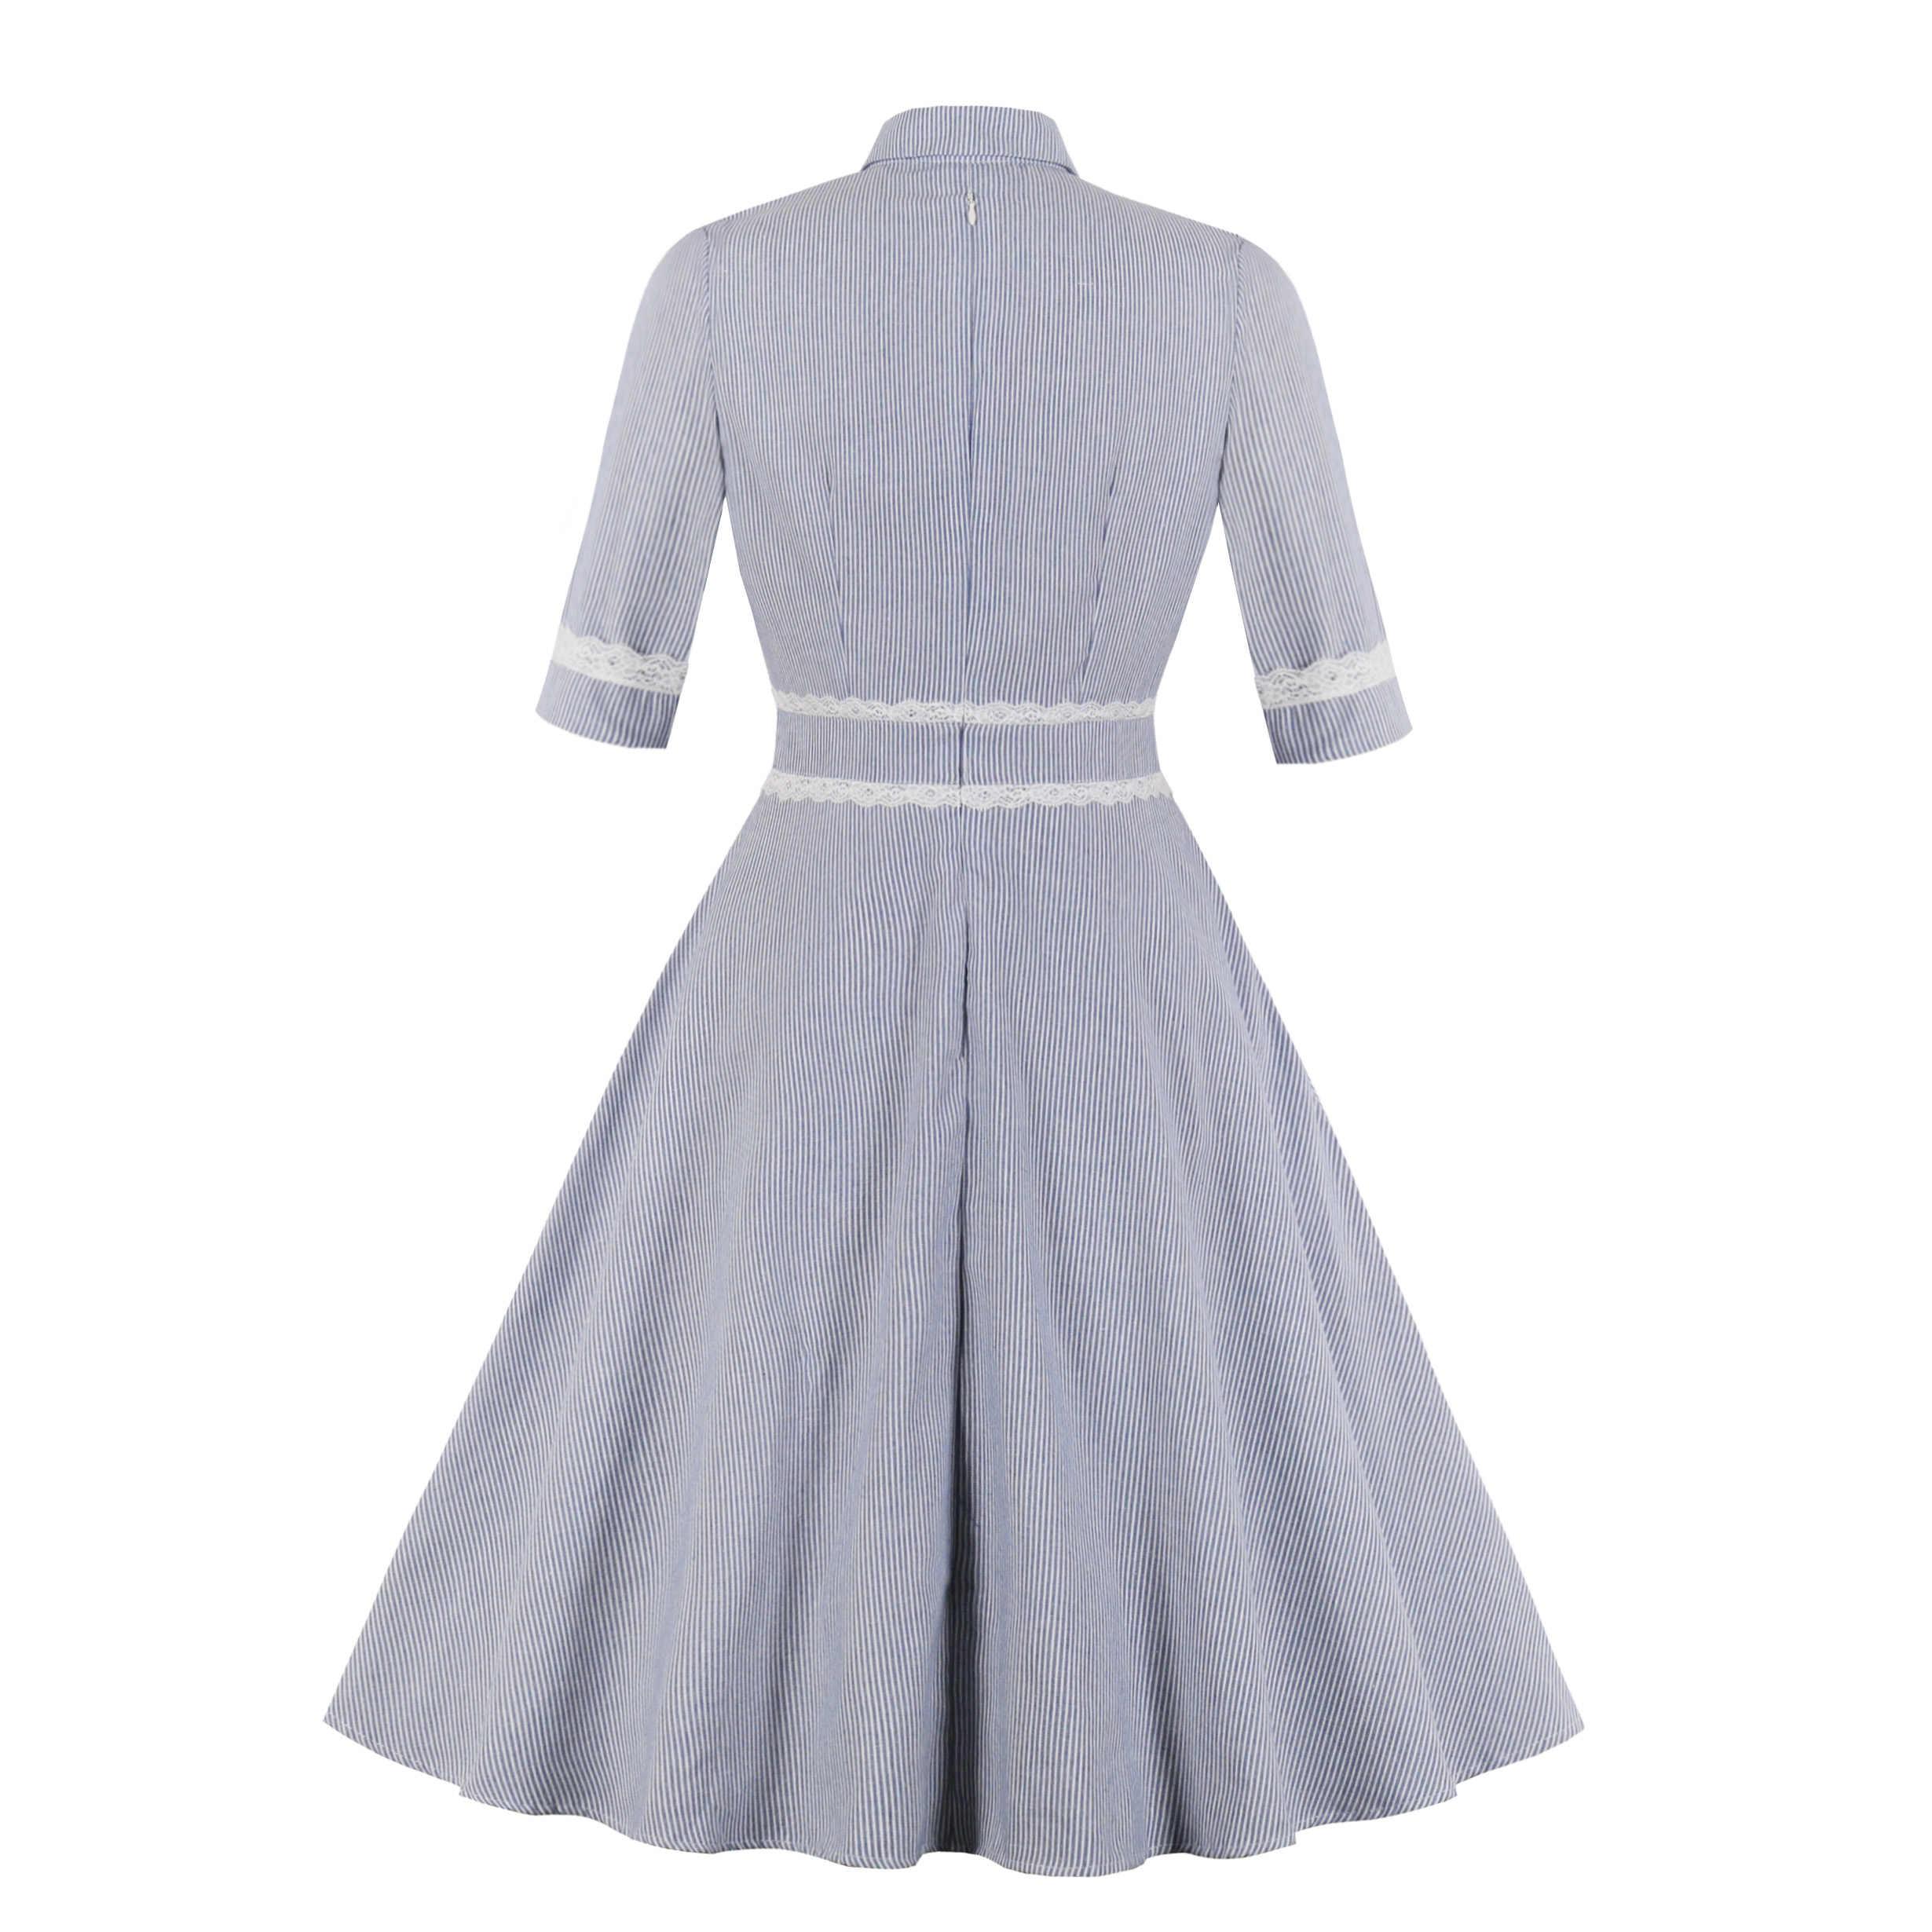 Women Summer Pin Up Stripe Casual Party Shirt Dress Half Sleeve Retro Robe 60s 50s Vintage Rockabilly Swing Dress Lace Vestidos Aliexpress